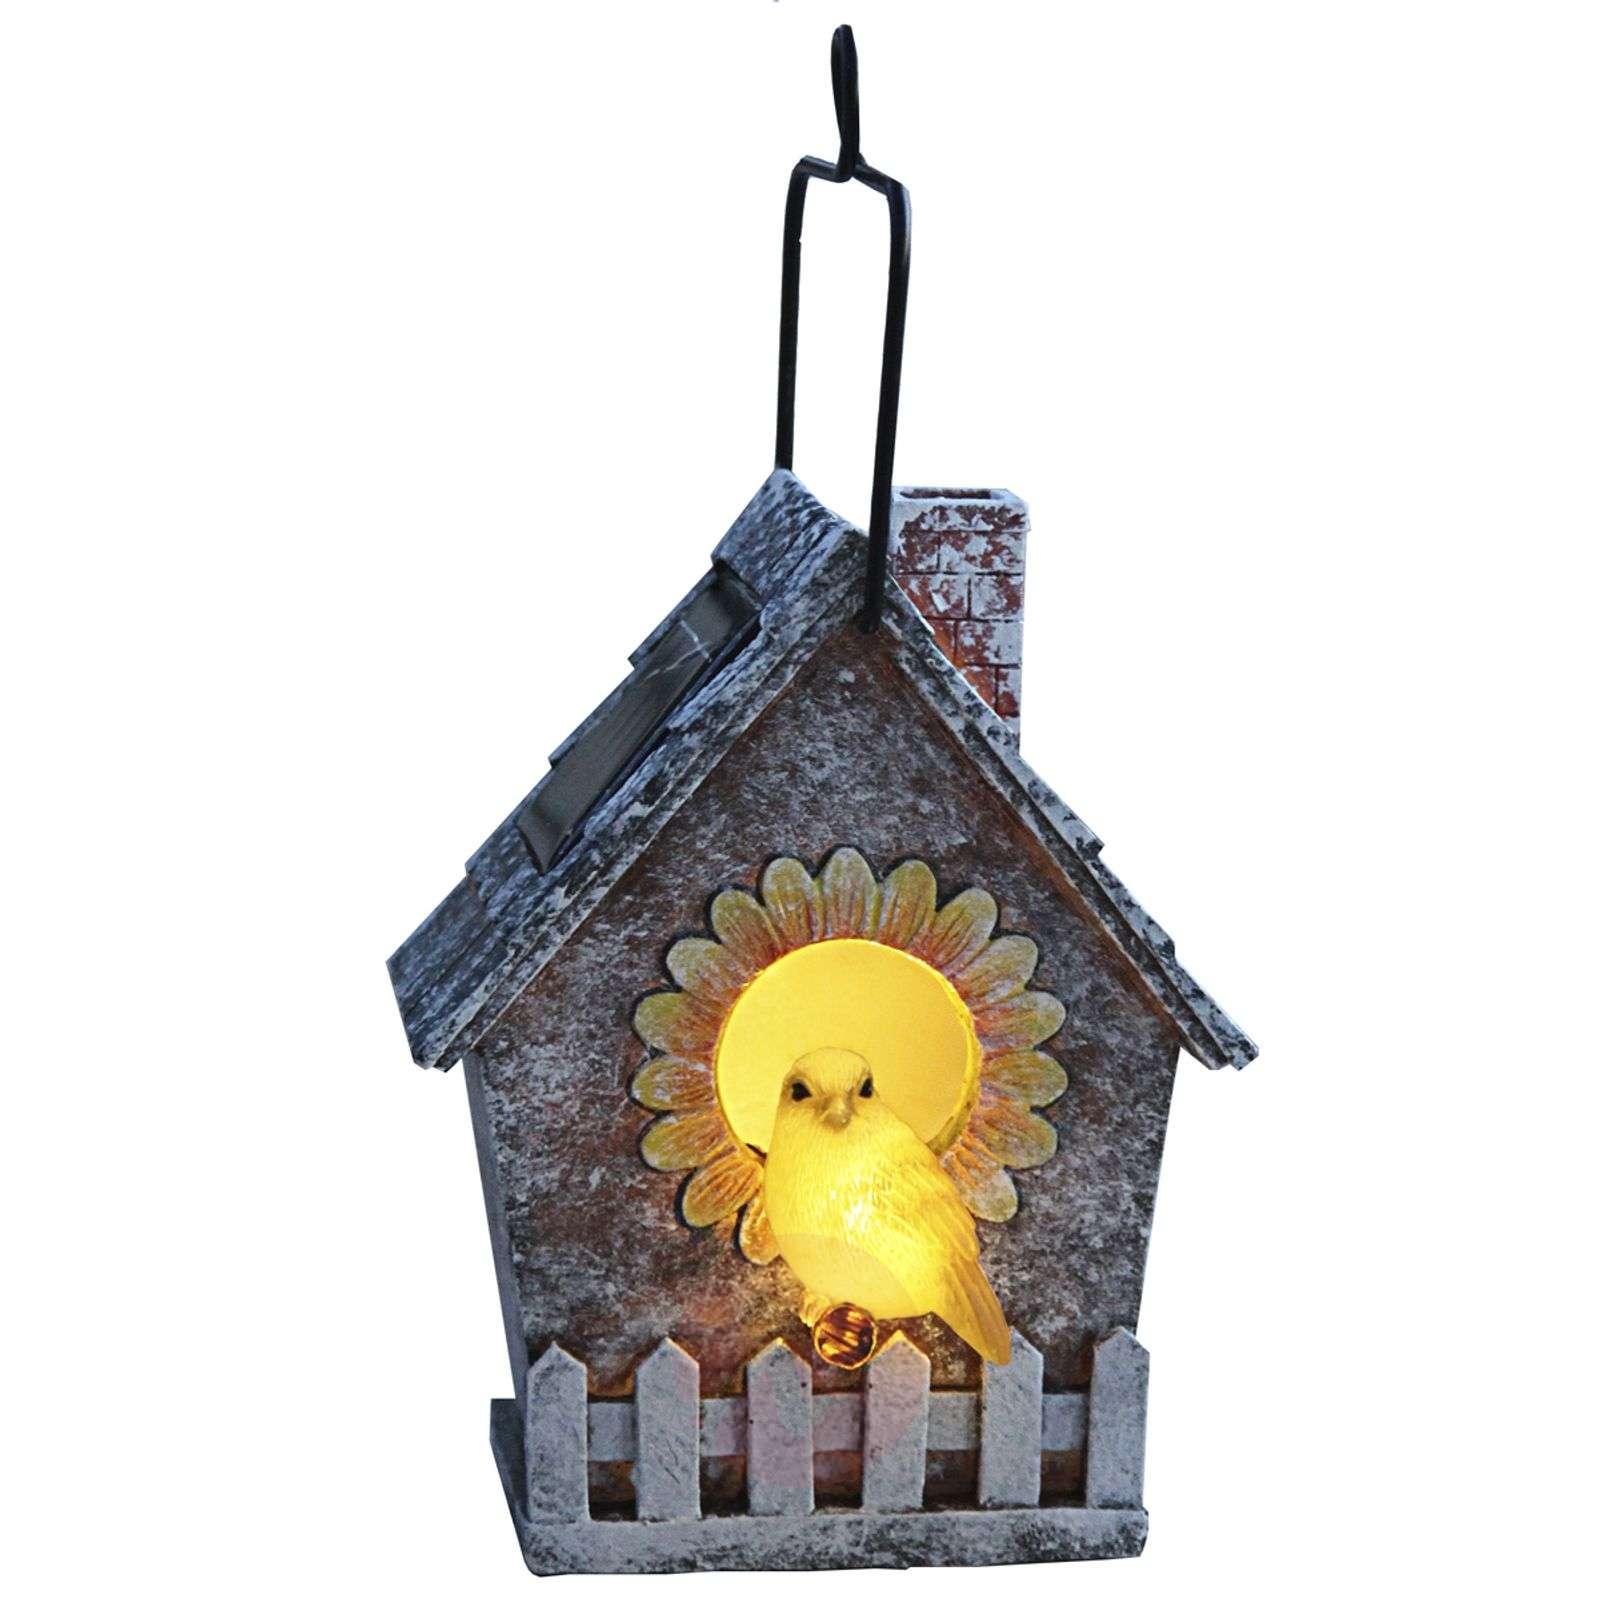 LED-aurinkokennovalaisin, linnunpönttö-1522720-01